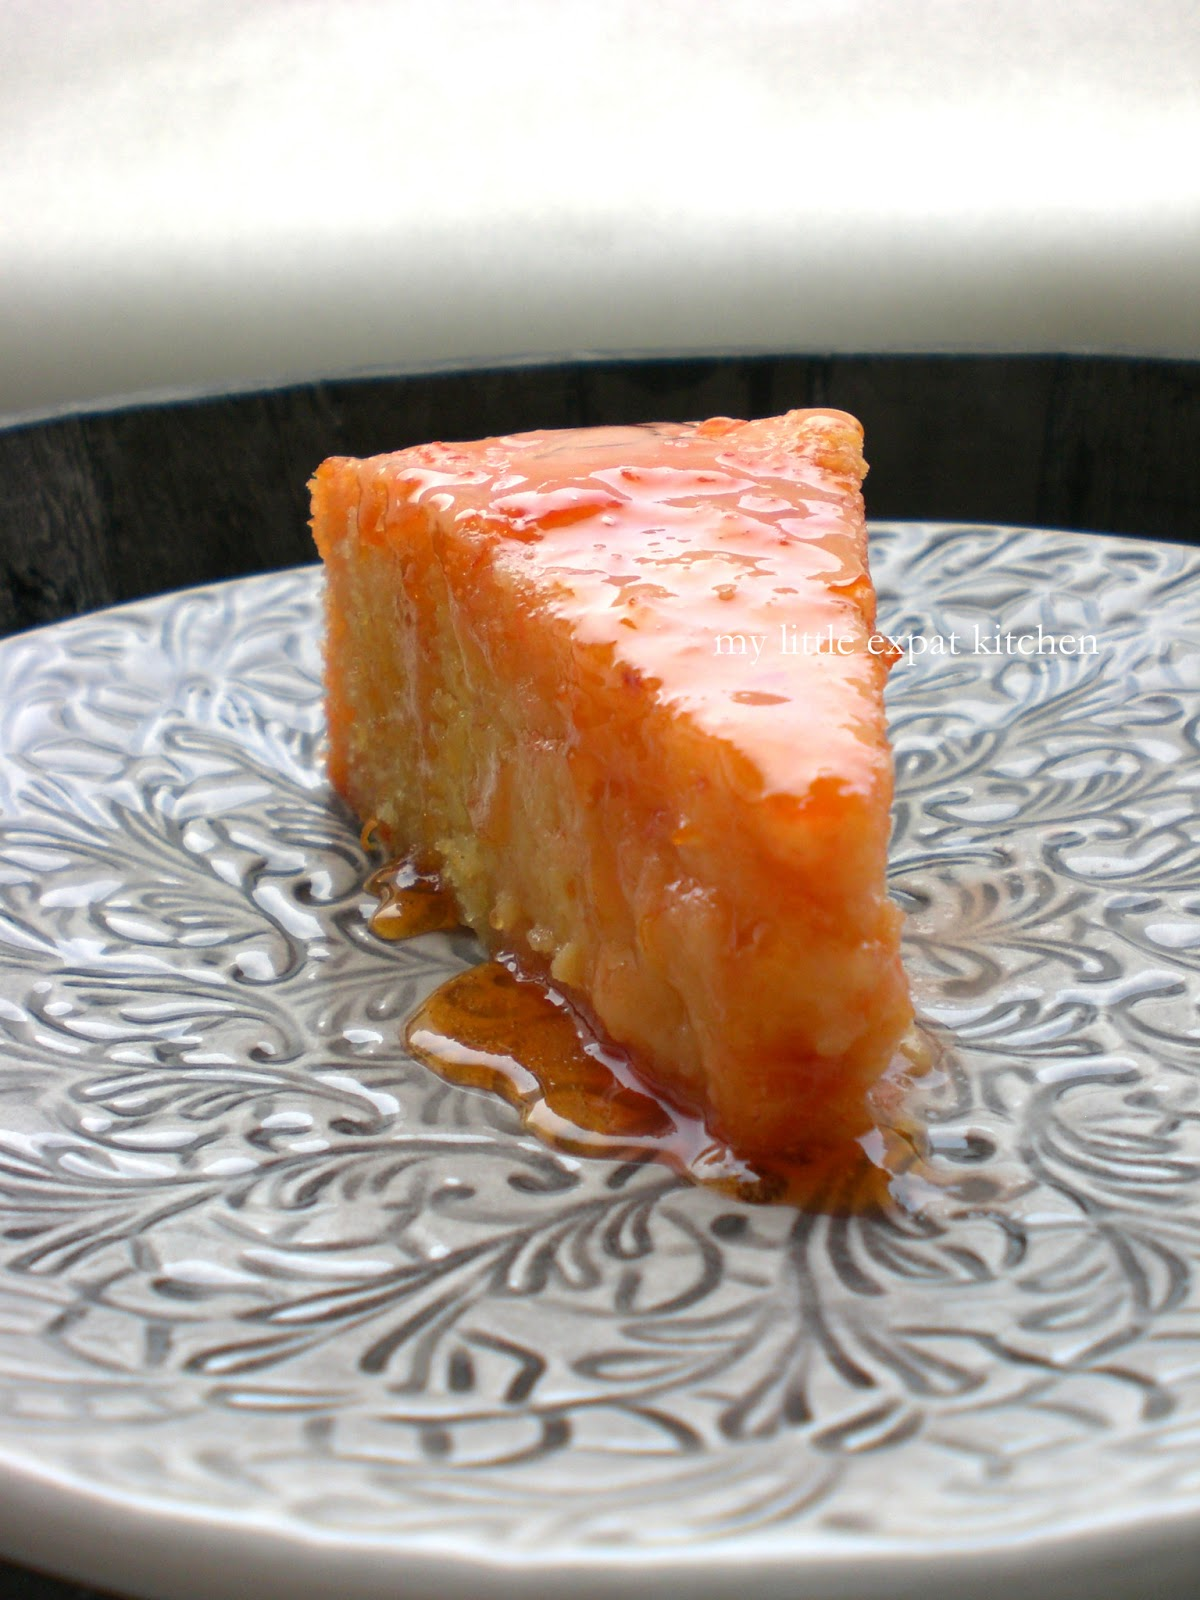 Blood orange syrup cake recipe